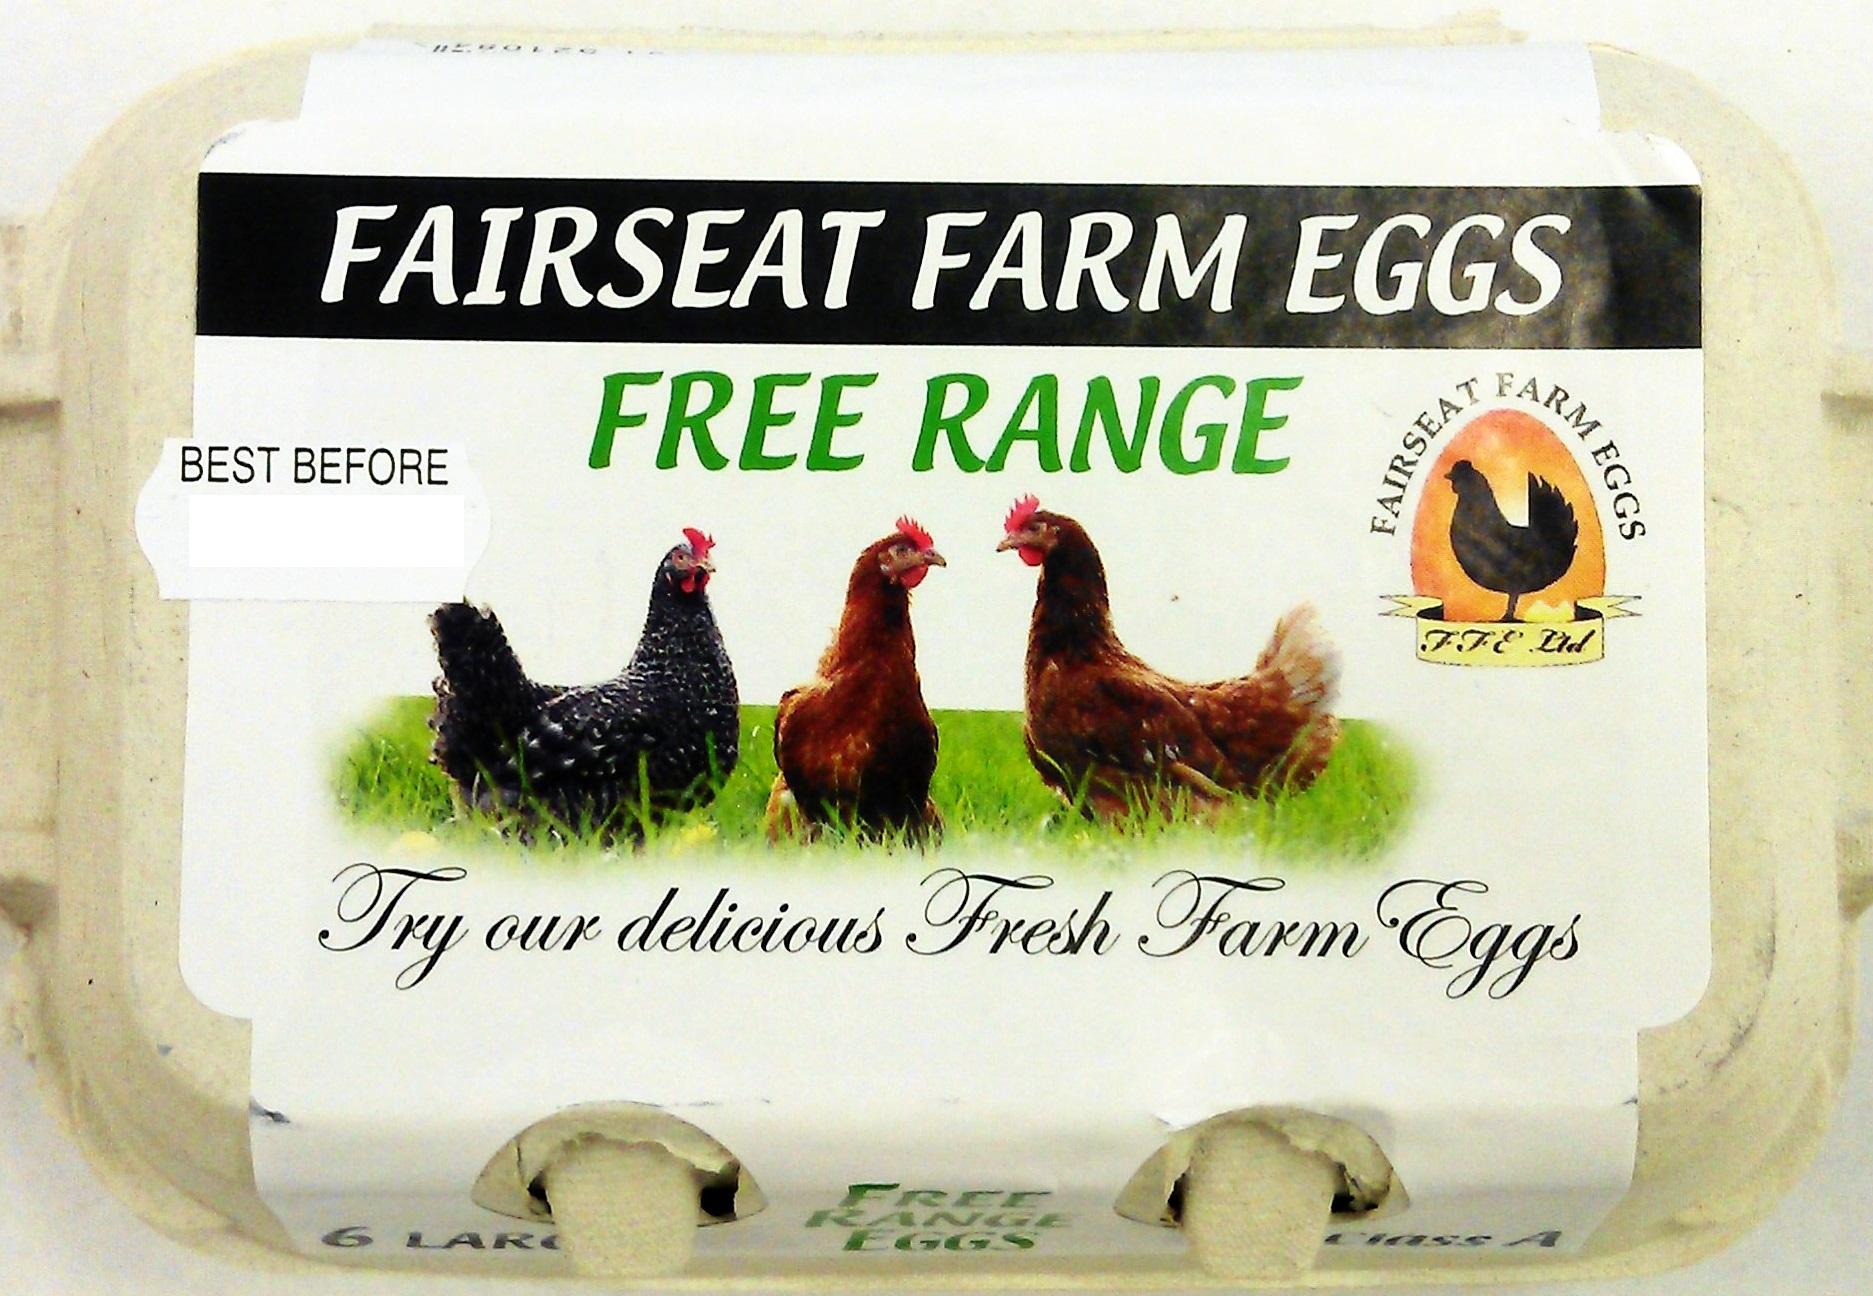 6 Large Free Range Eggs